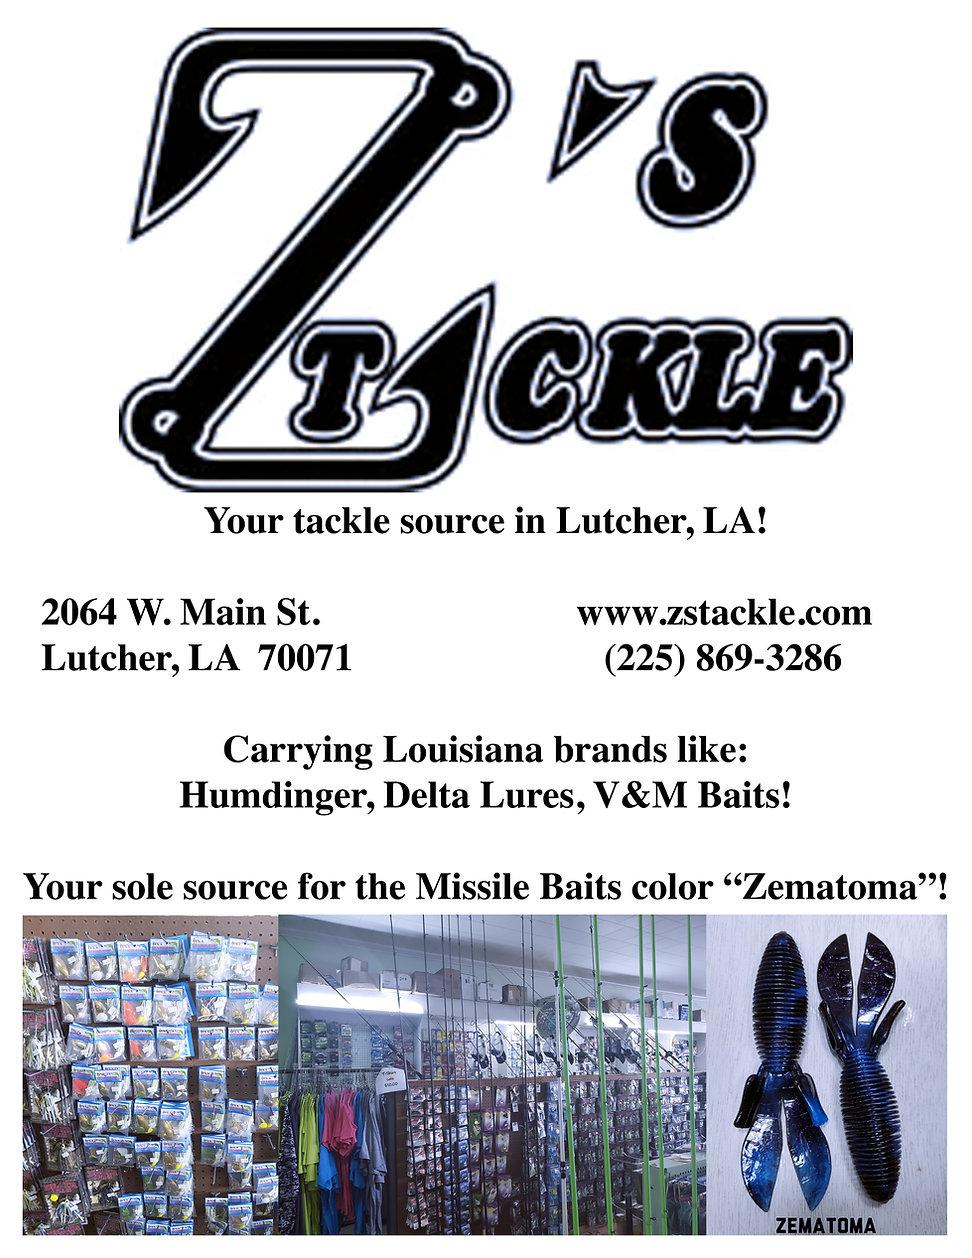 Z's Tackle Ad.jpg